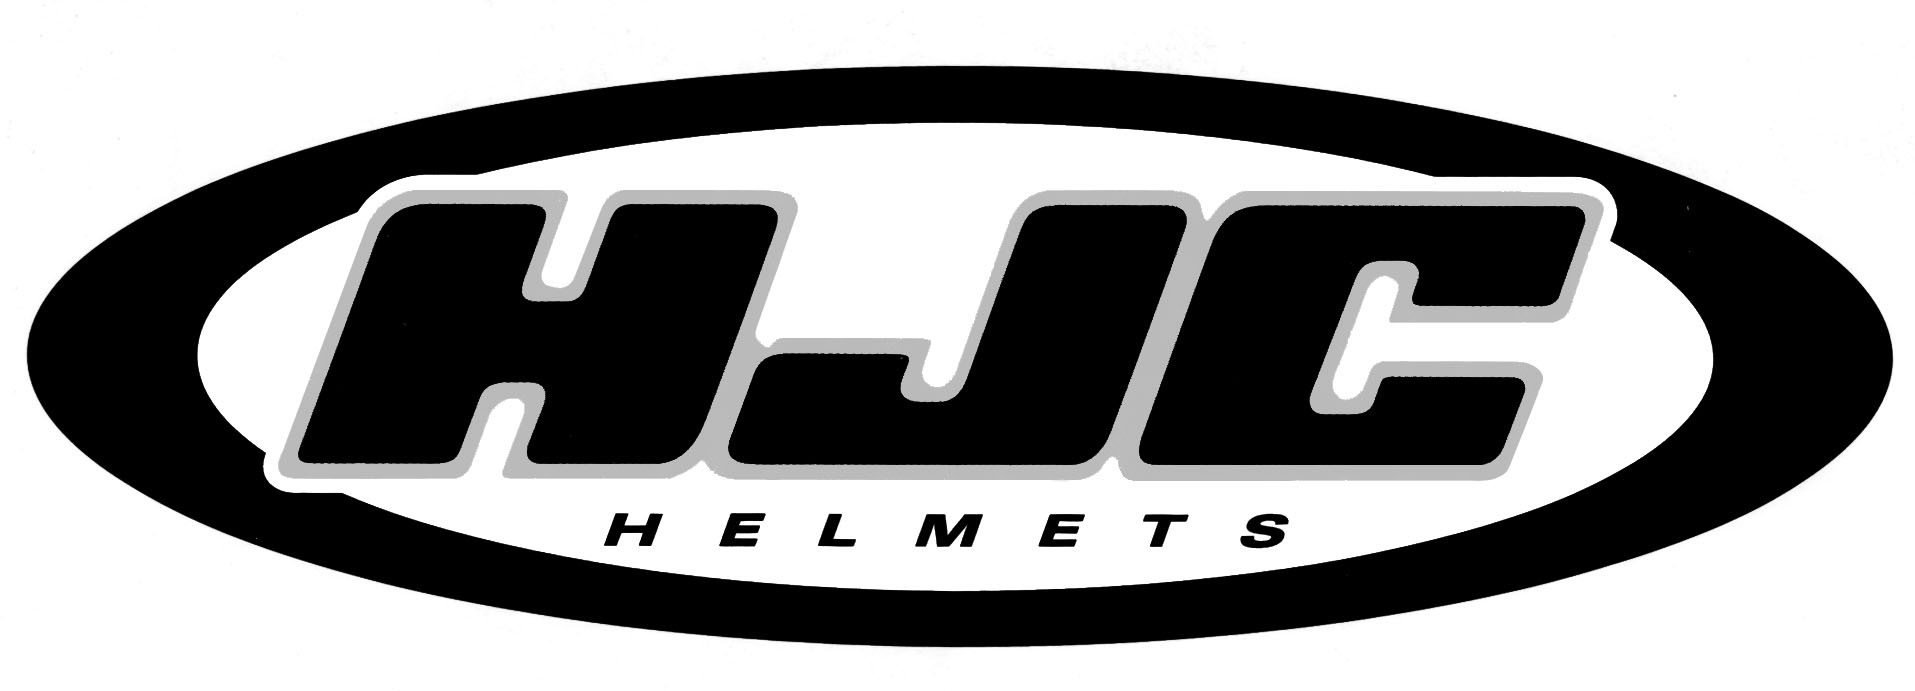 Agv Helmets Logo Vector PNG - 101976